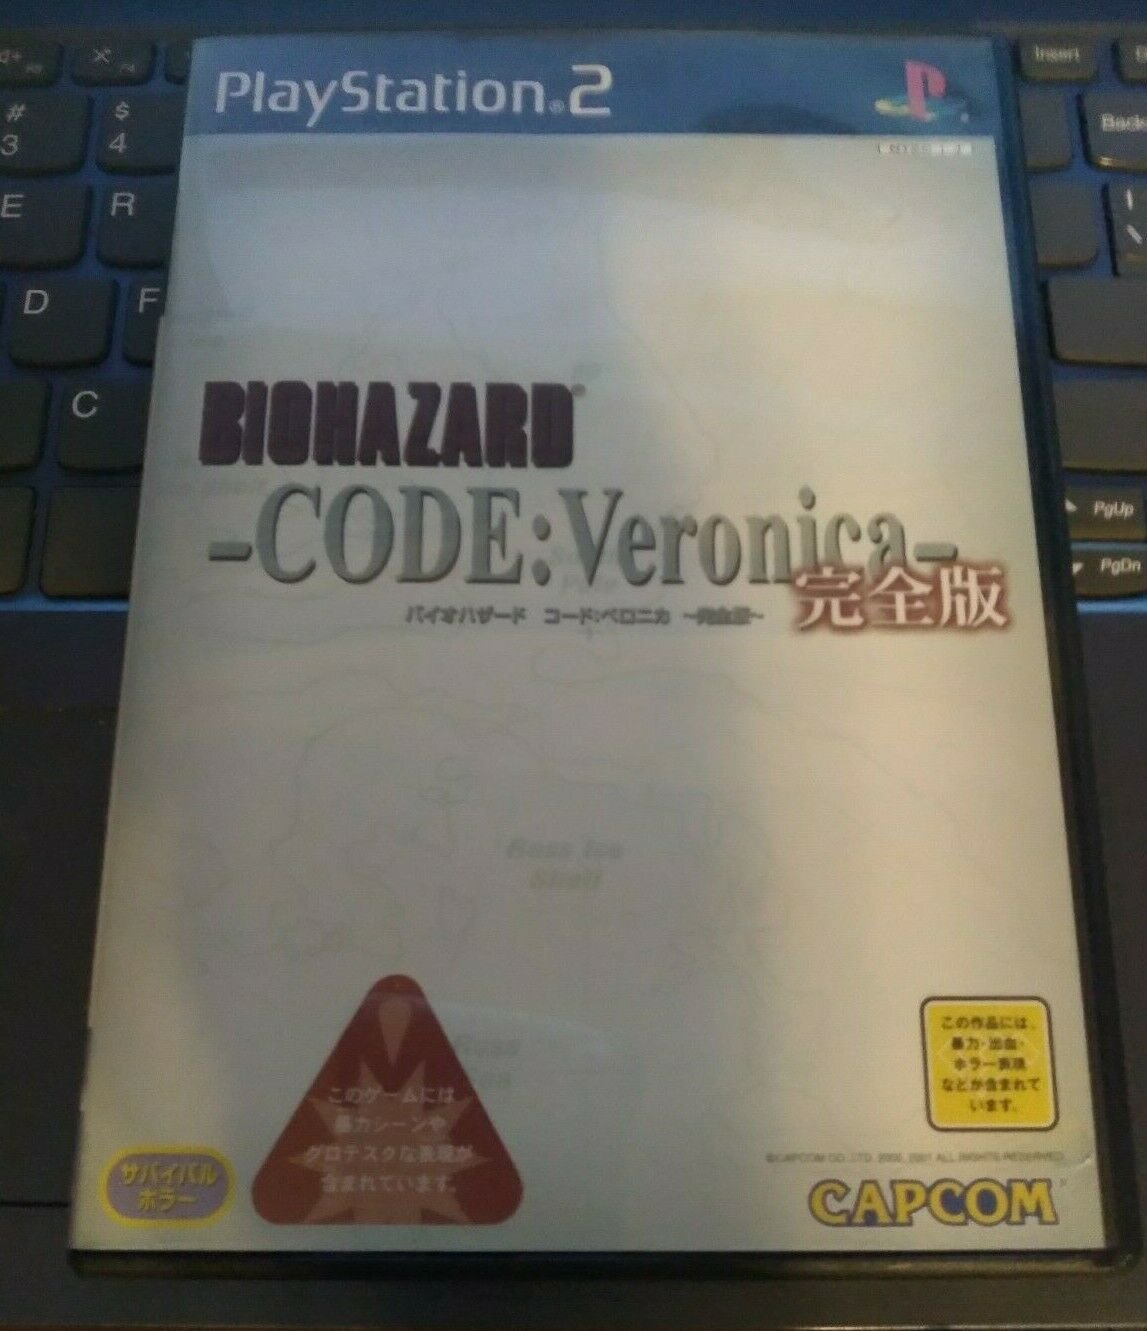 BioHazard Code: Veronica (PlayStation 2) JAPAN IMPORT READ PS2 Resident Evil